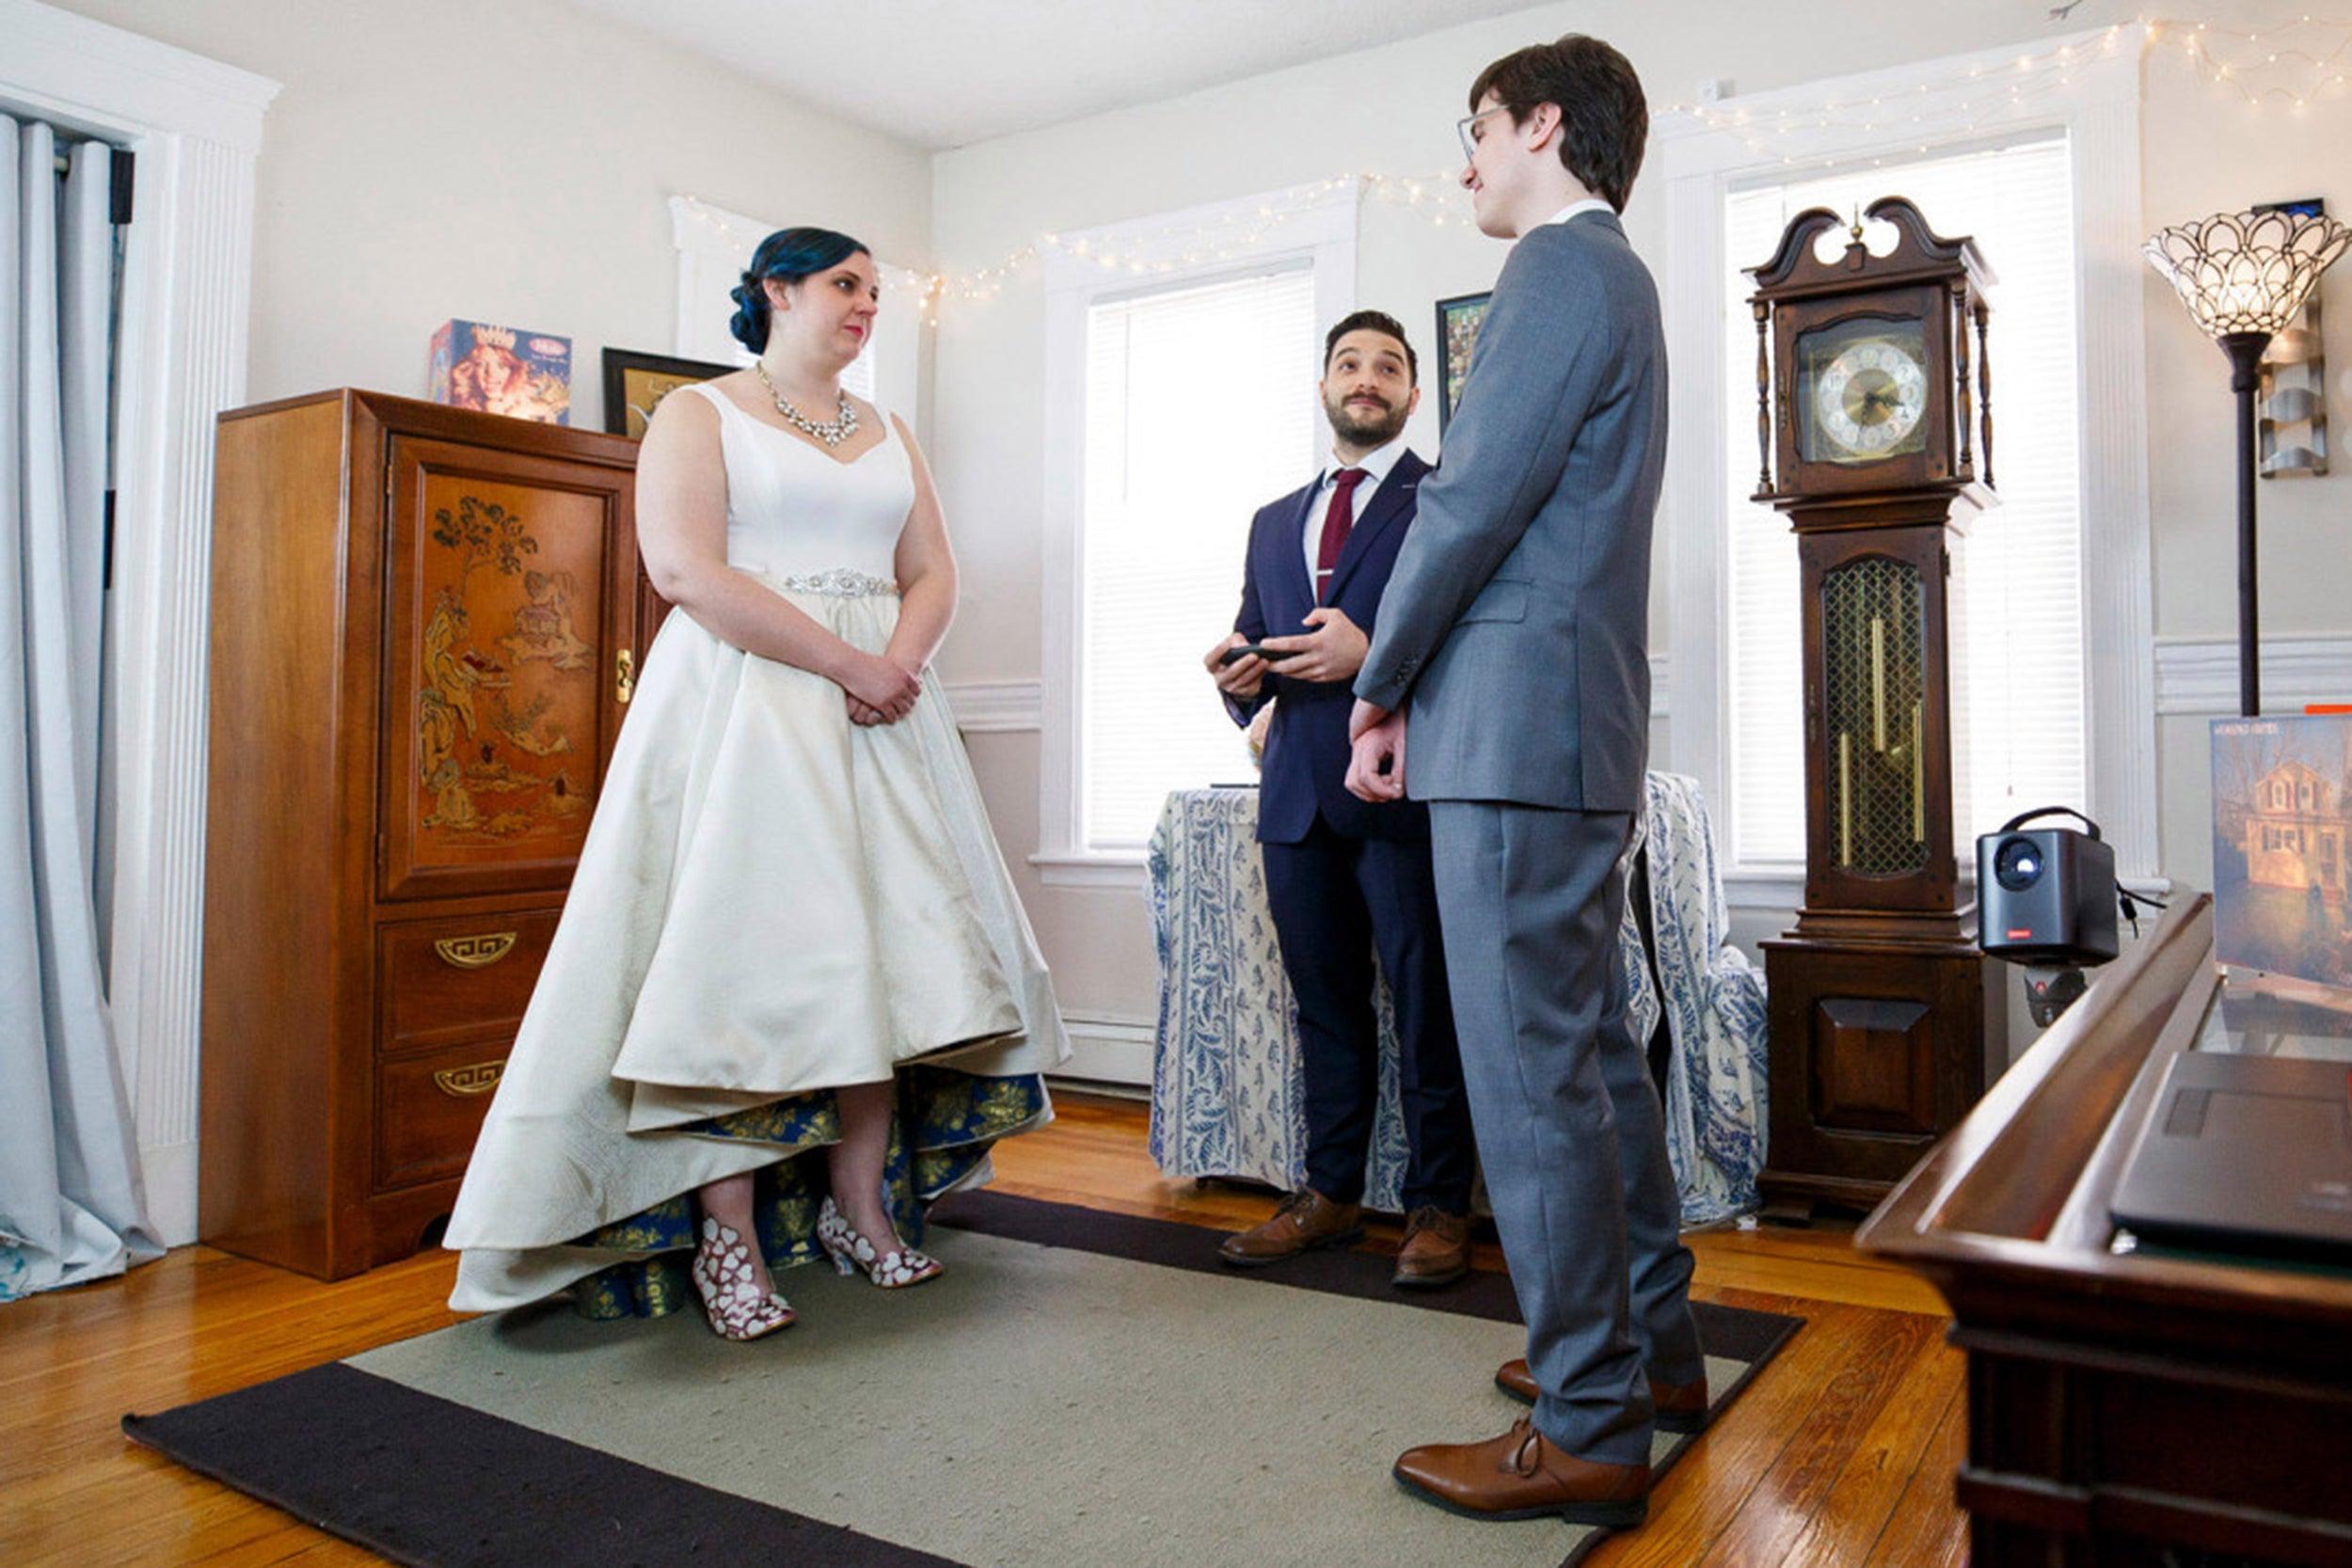 Lisa Albert and Matthew Tuttle at their Zoom wedding.